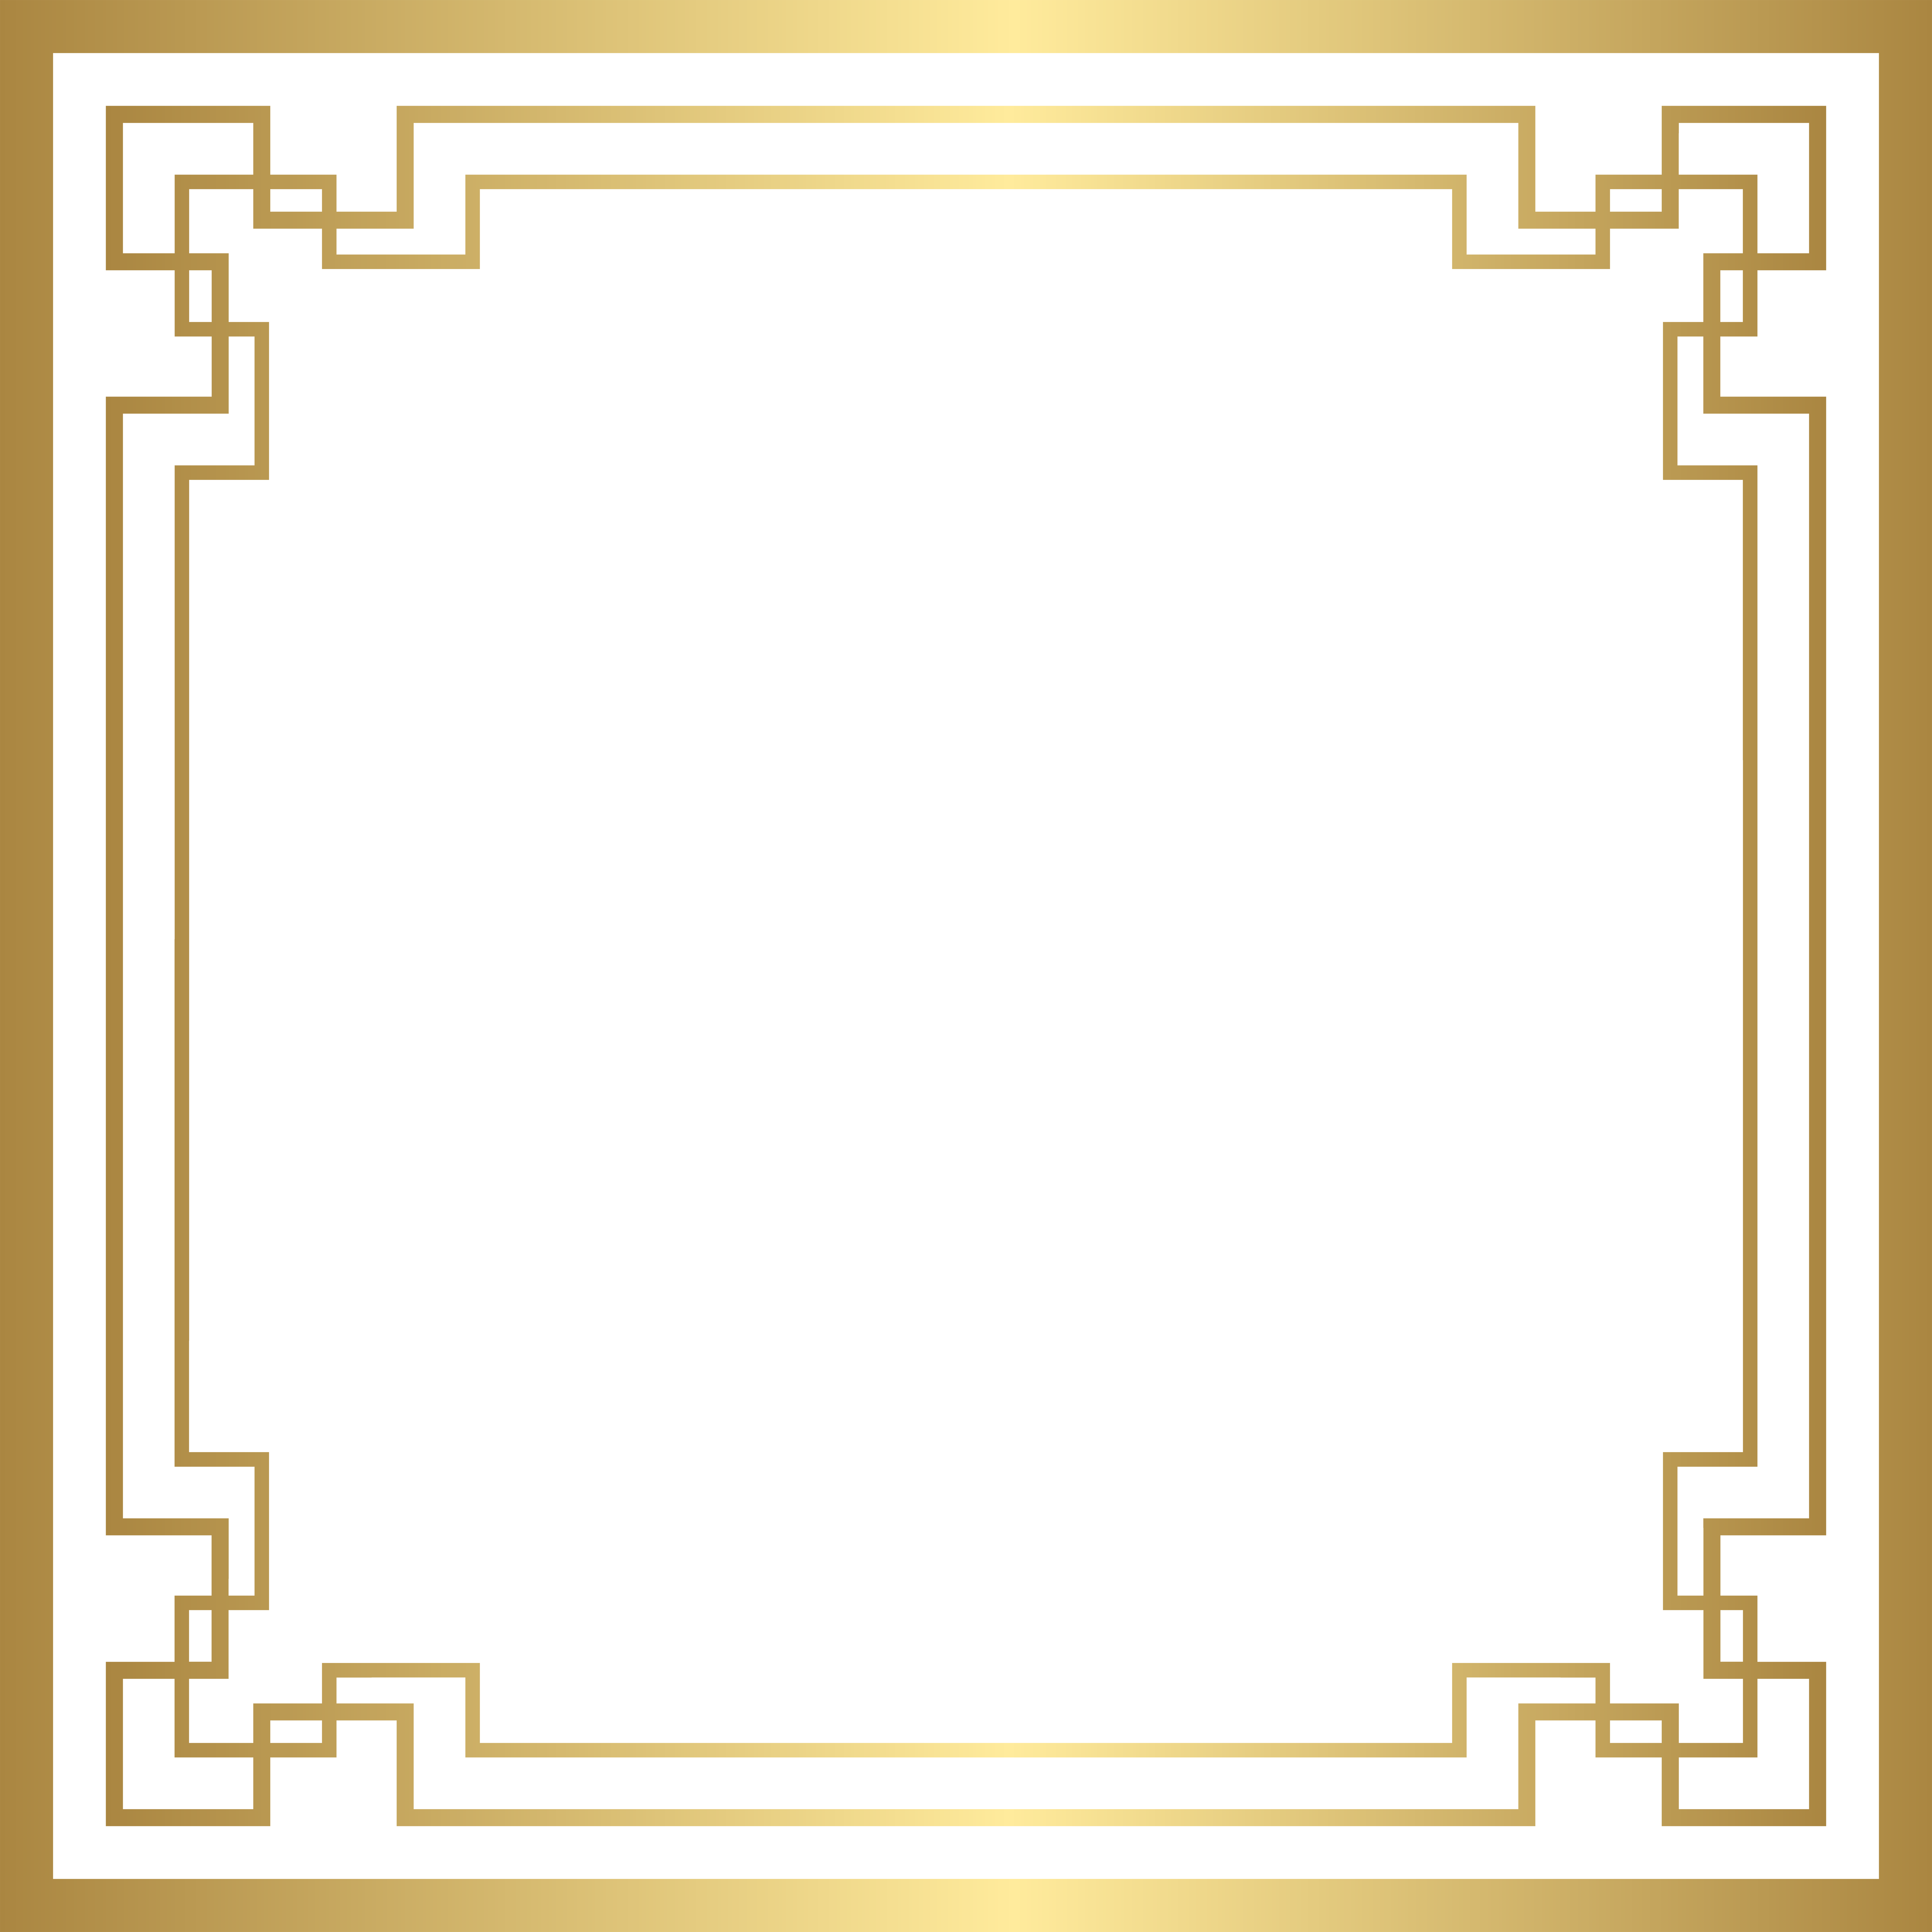 Free Art Deco Png Frames & Free Art Deco Frames.png Transparent.